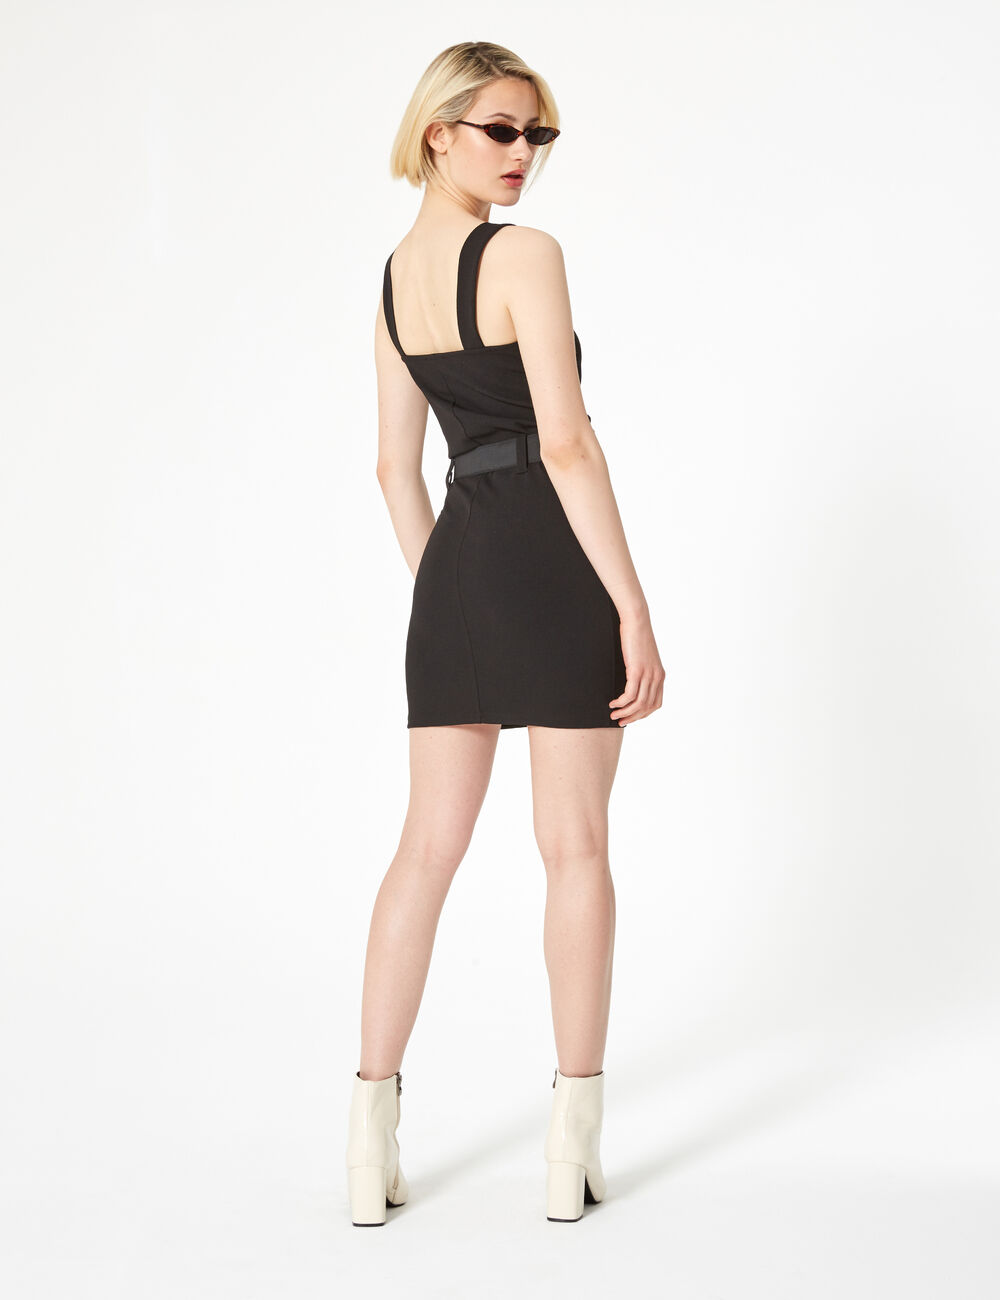 7defe667fcdf2 Robe zippée avec ceinture noire femme • Jennyfer